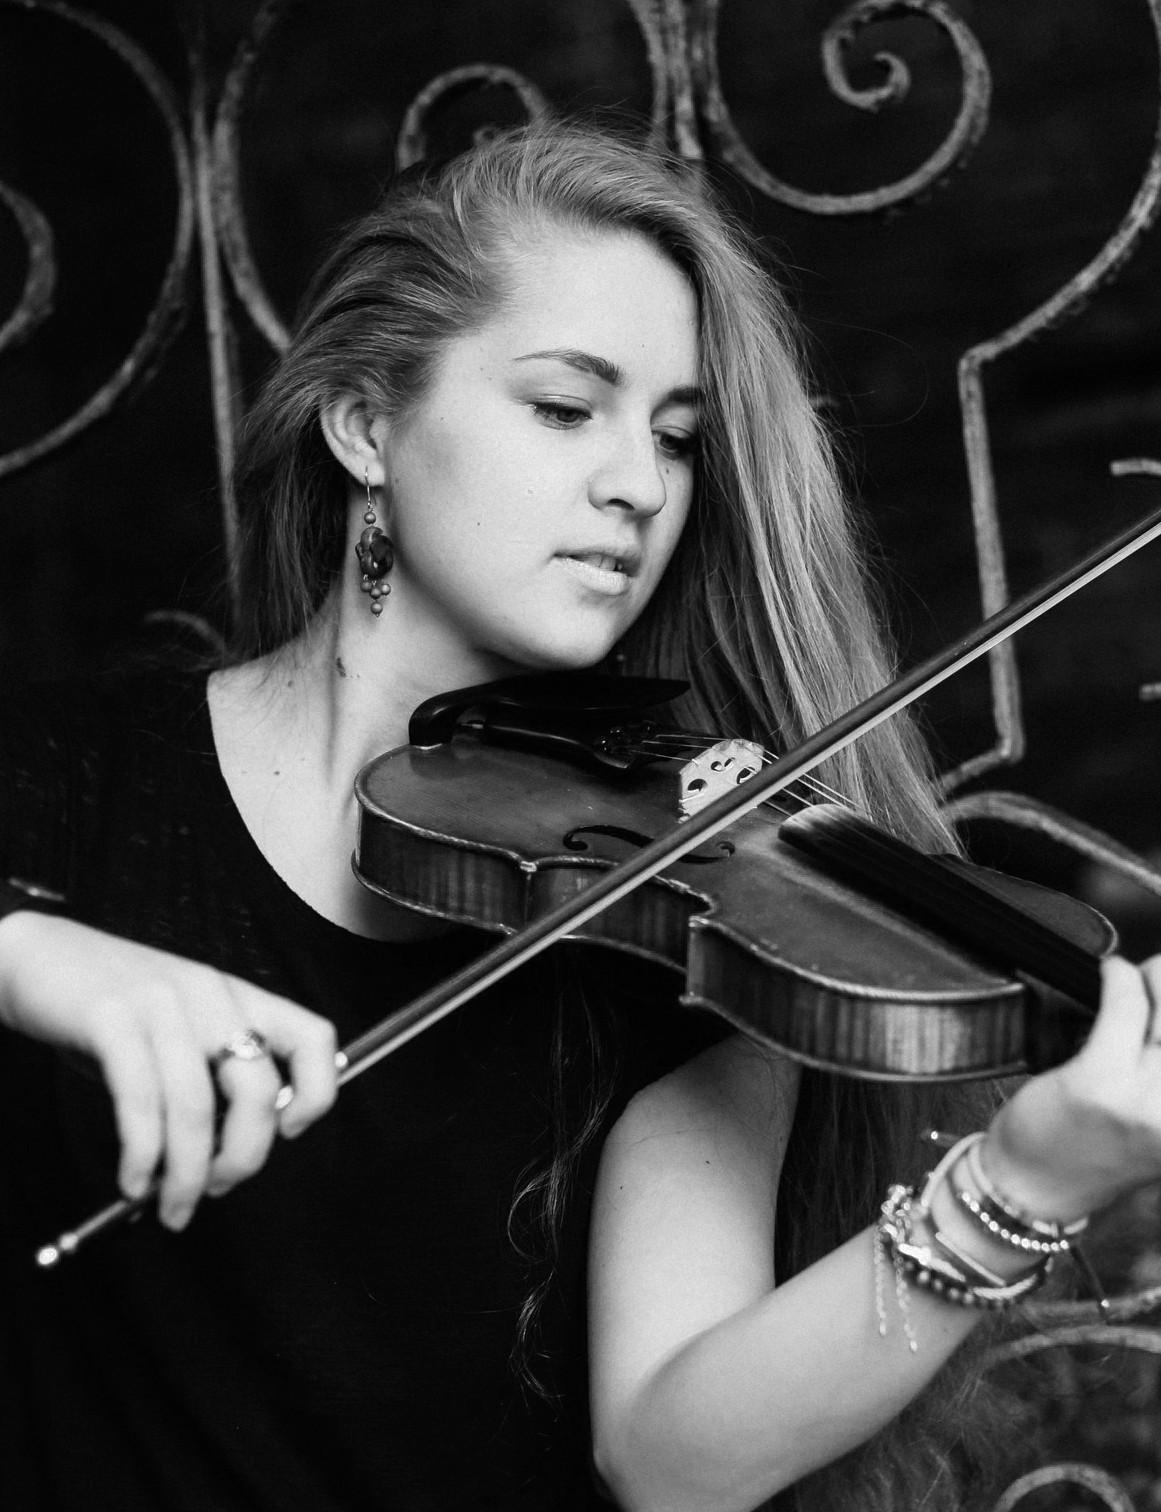 Kateryna Kostiuchenko